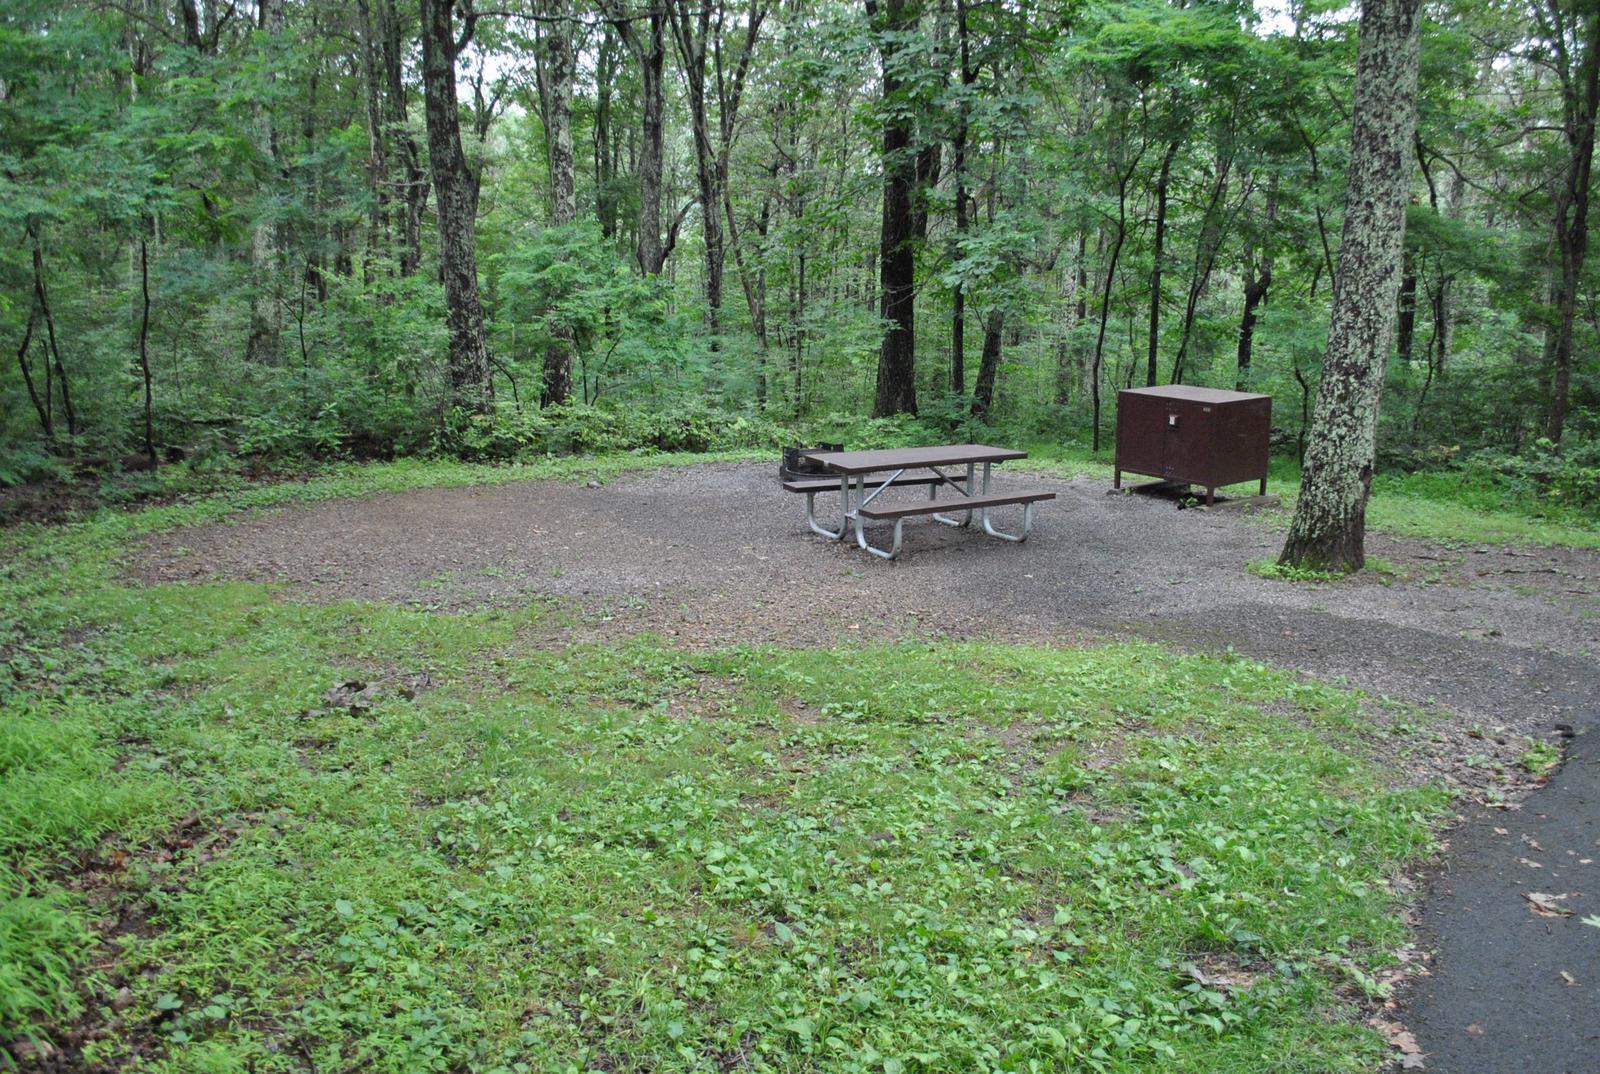 Mathews Arm Campground – Site A027